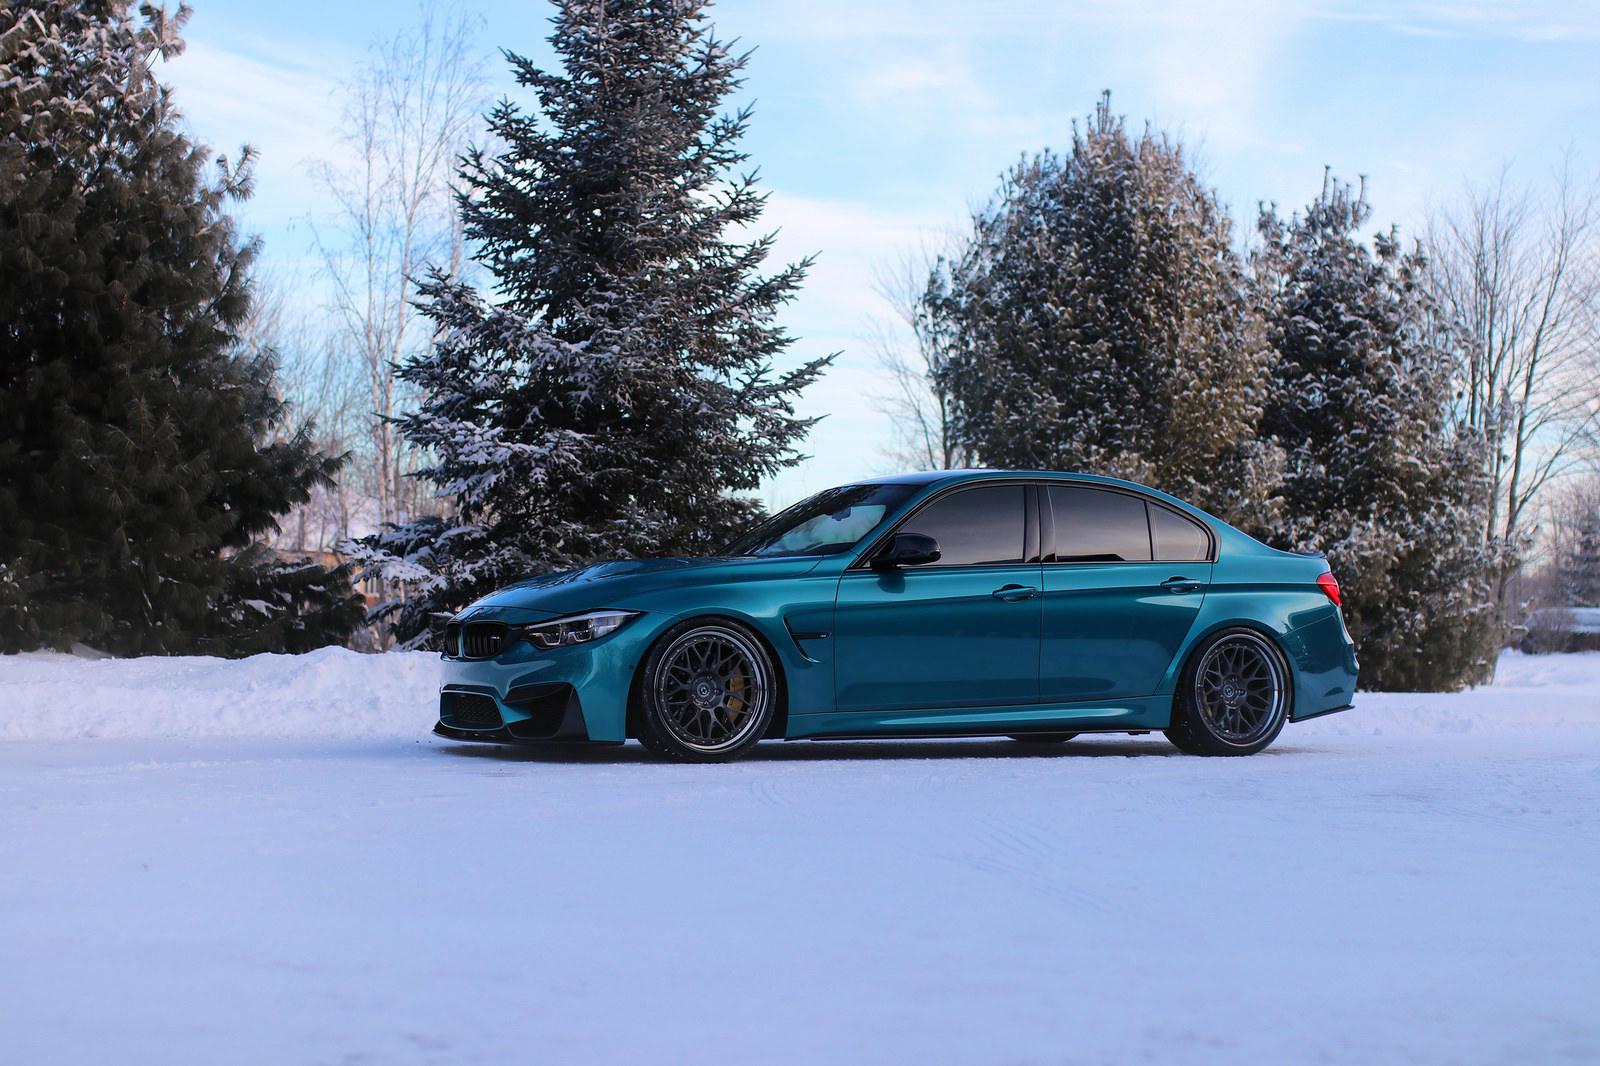 BMW M3 in nuanta Atlantis Blue - BMW M3 in nuanta Atlantis Blue